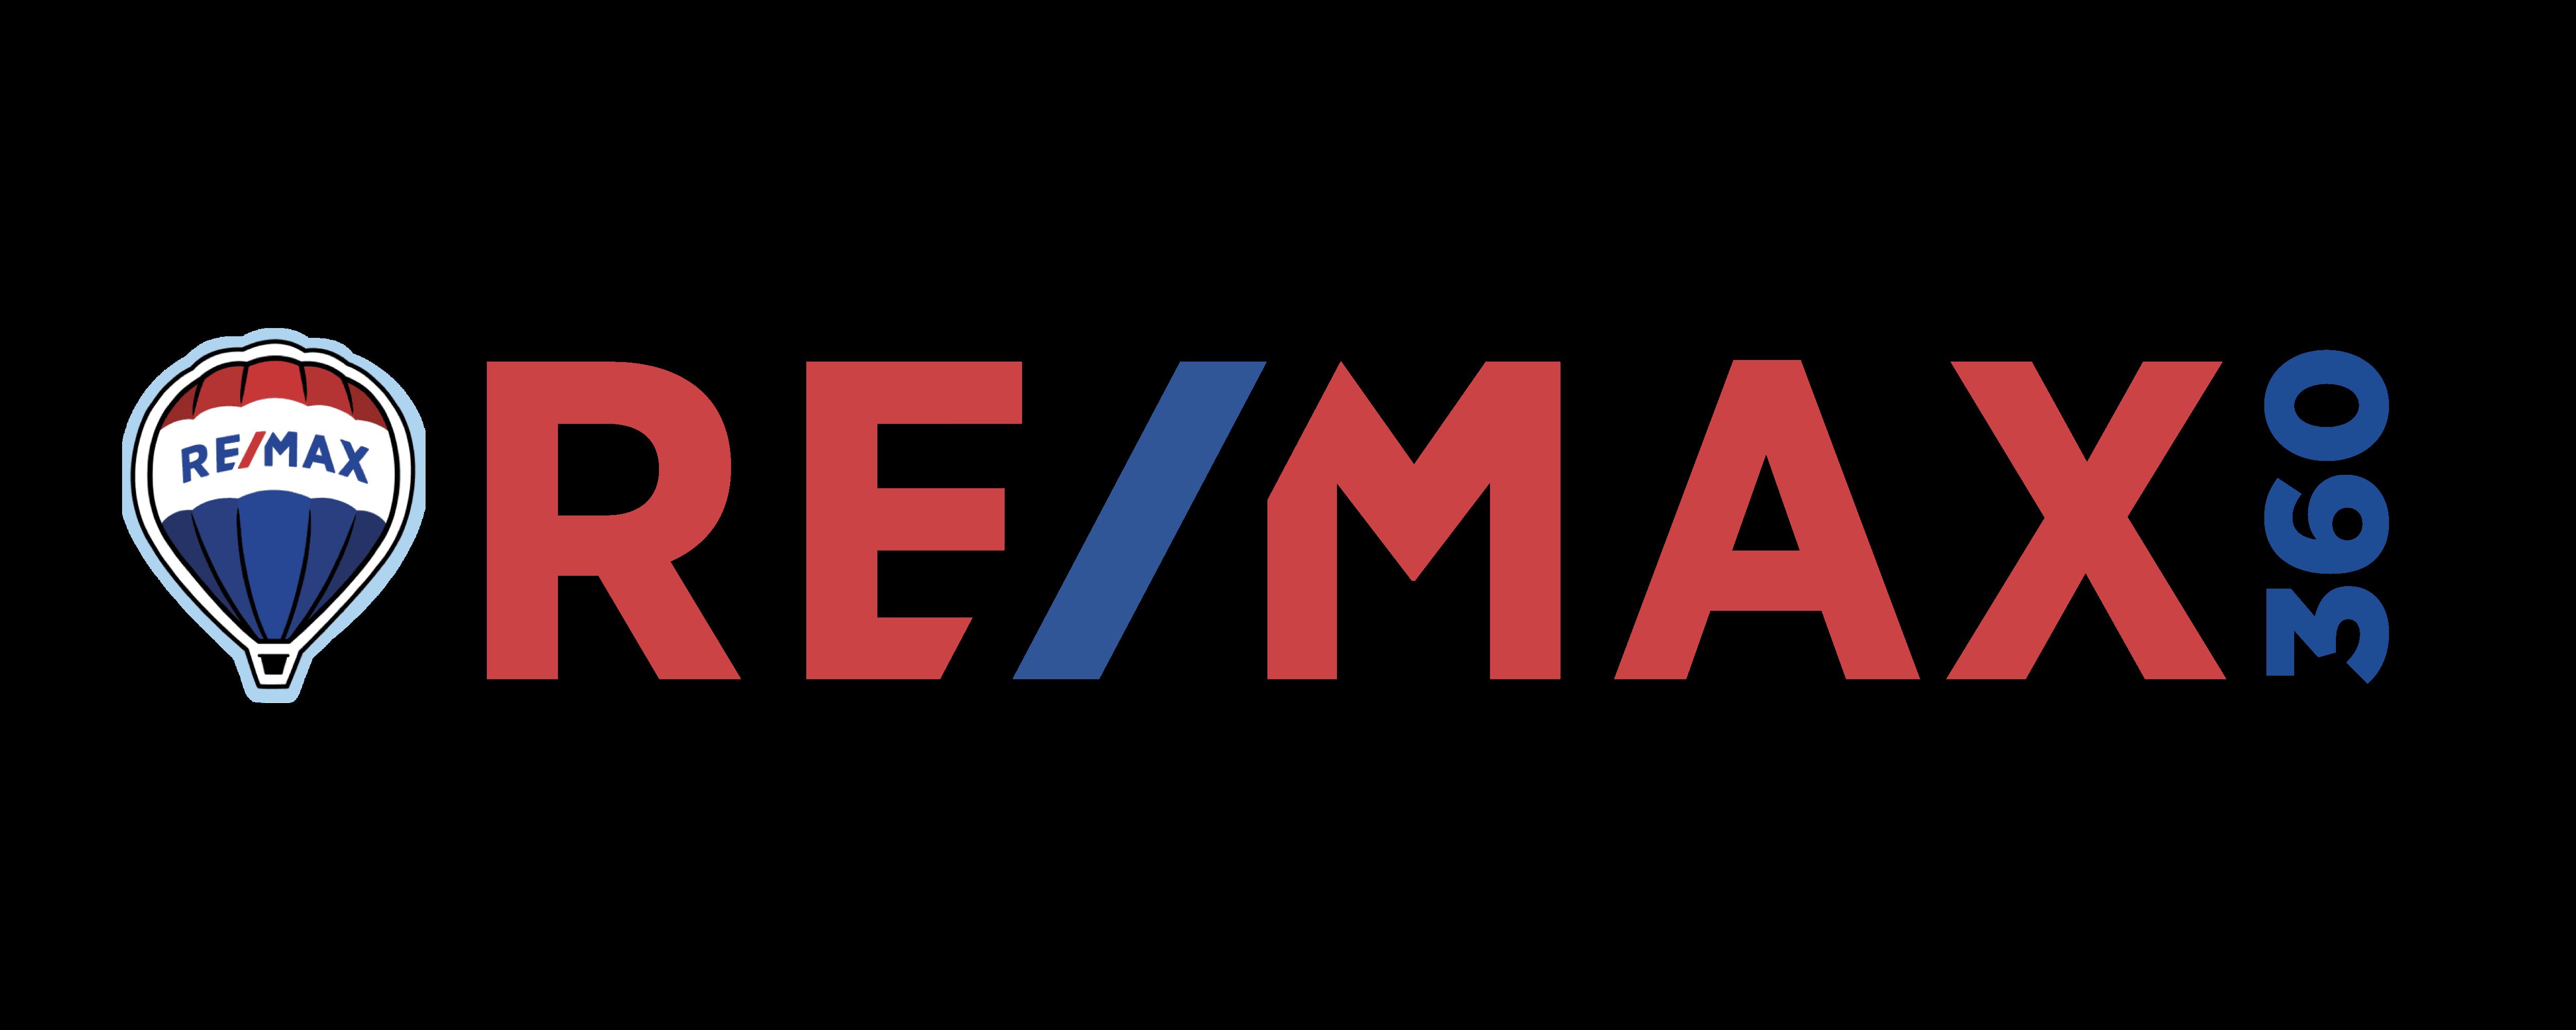 logo - RE/MAX 360